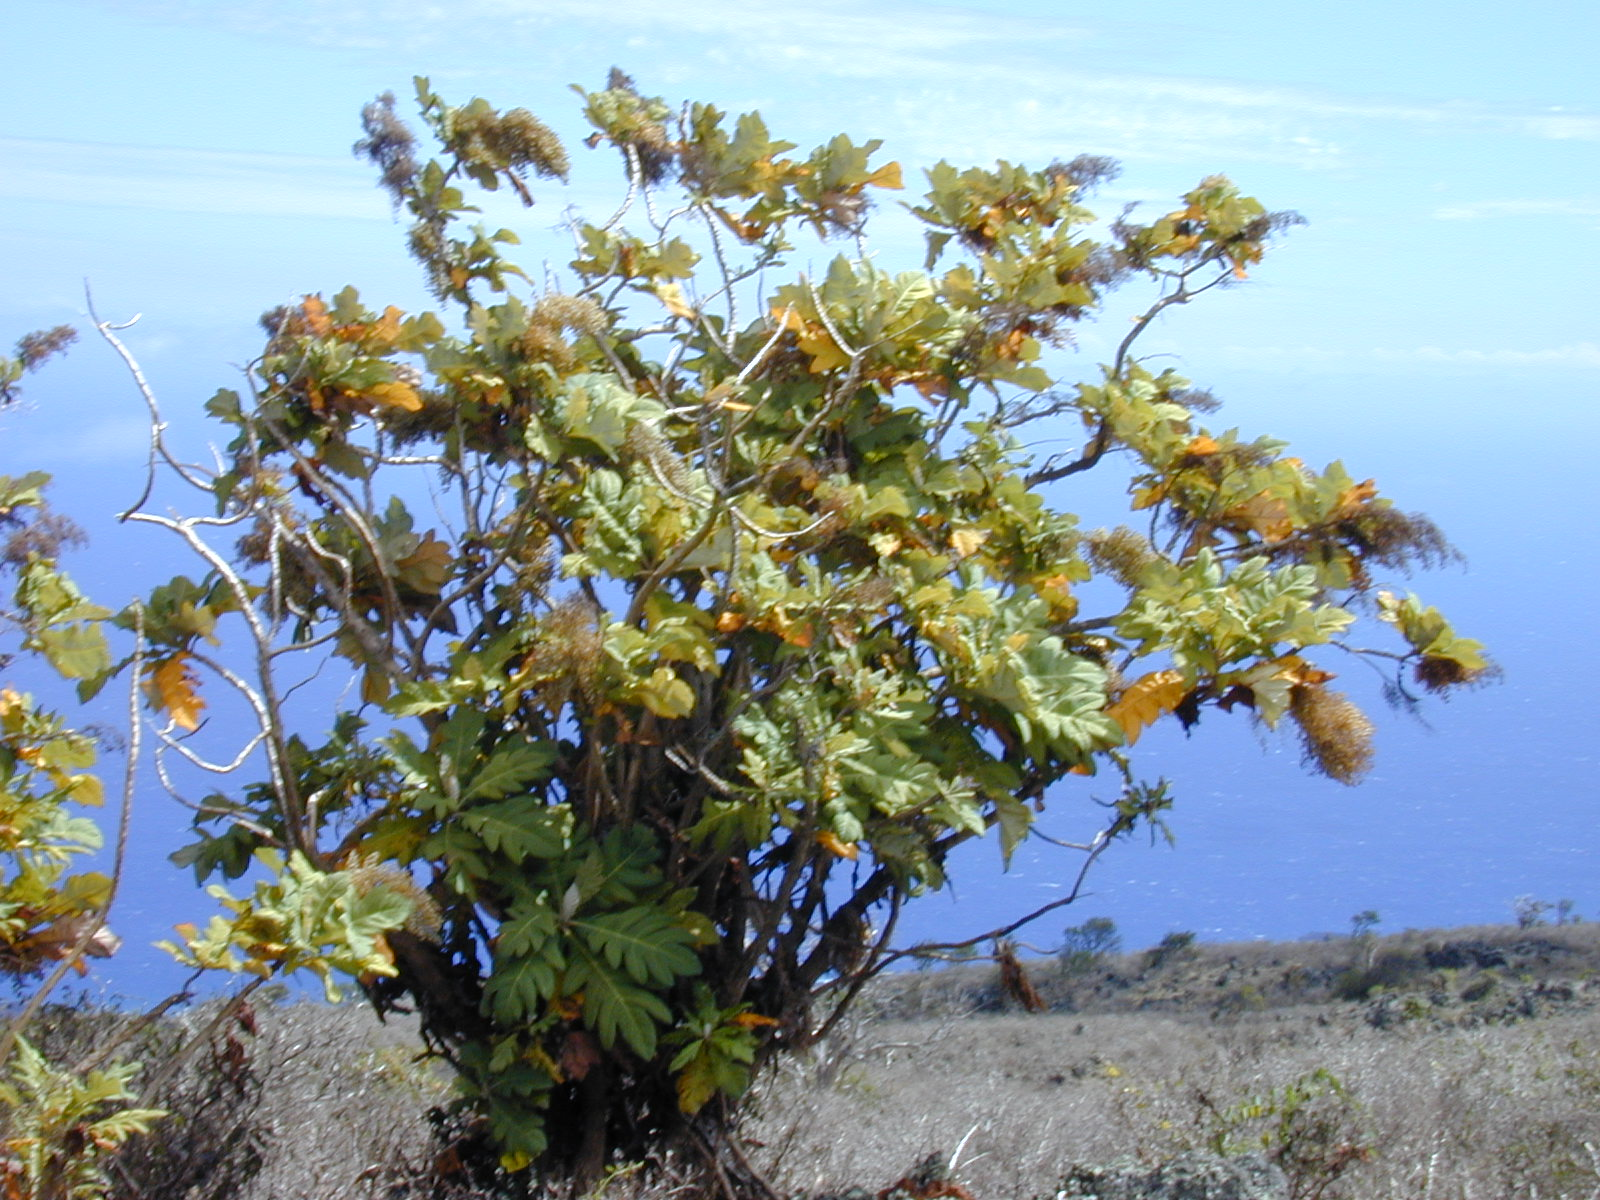 Starr 010714-0013 Bocconia frutescens.jpg © Forest & Kim Starr